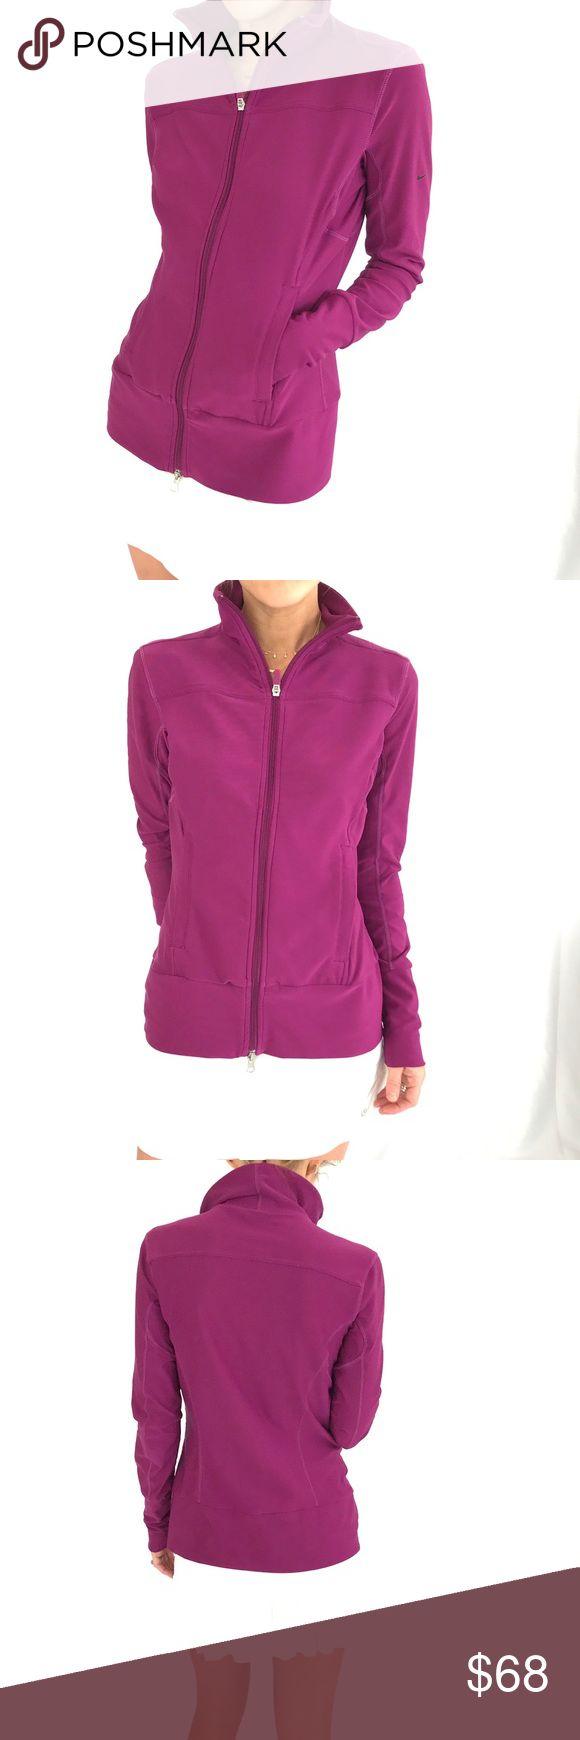 Nike purple zip up jacket Nike purple zip up jacket.  Like new condition. Nike Jackets & Coats